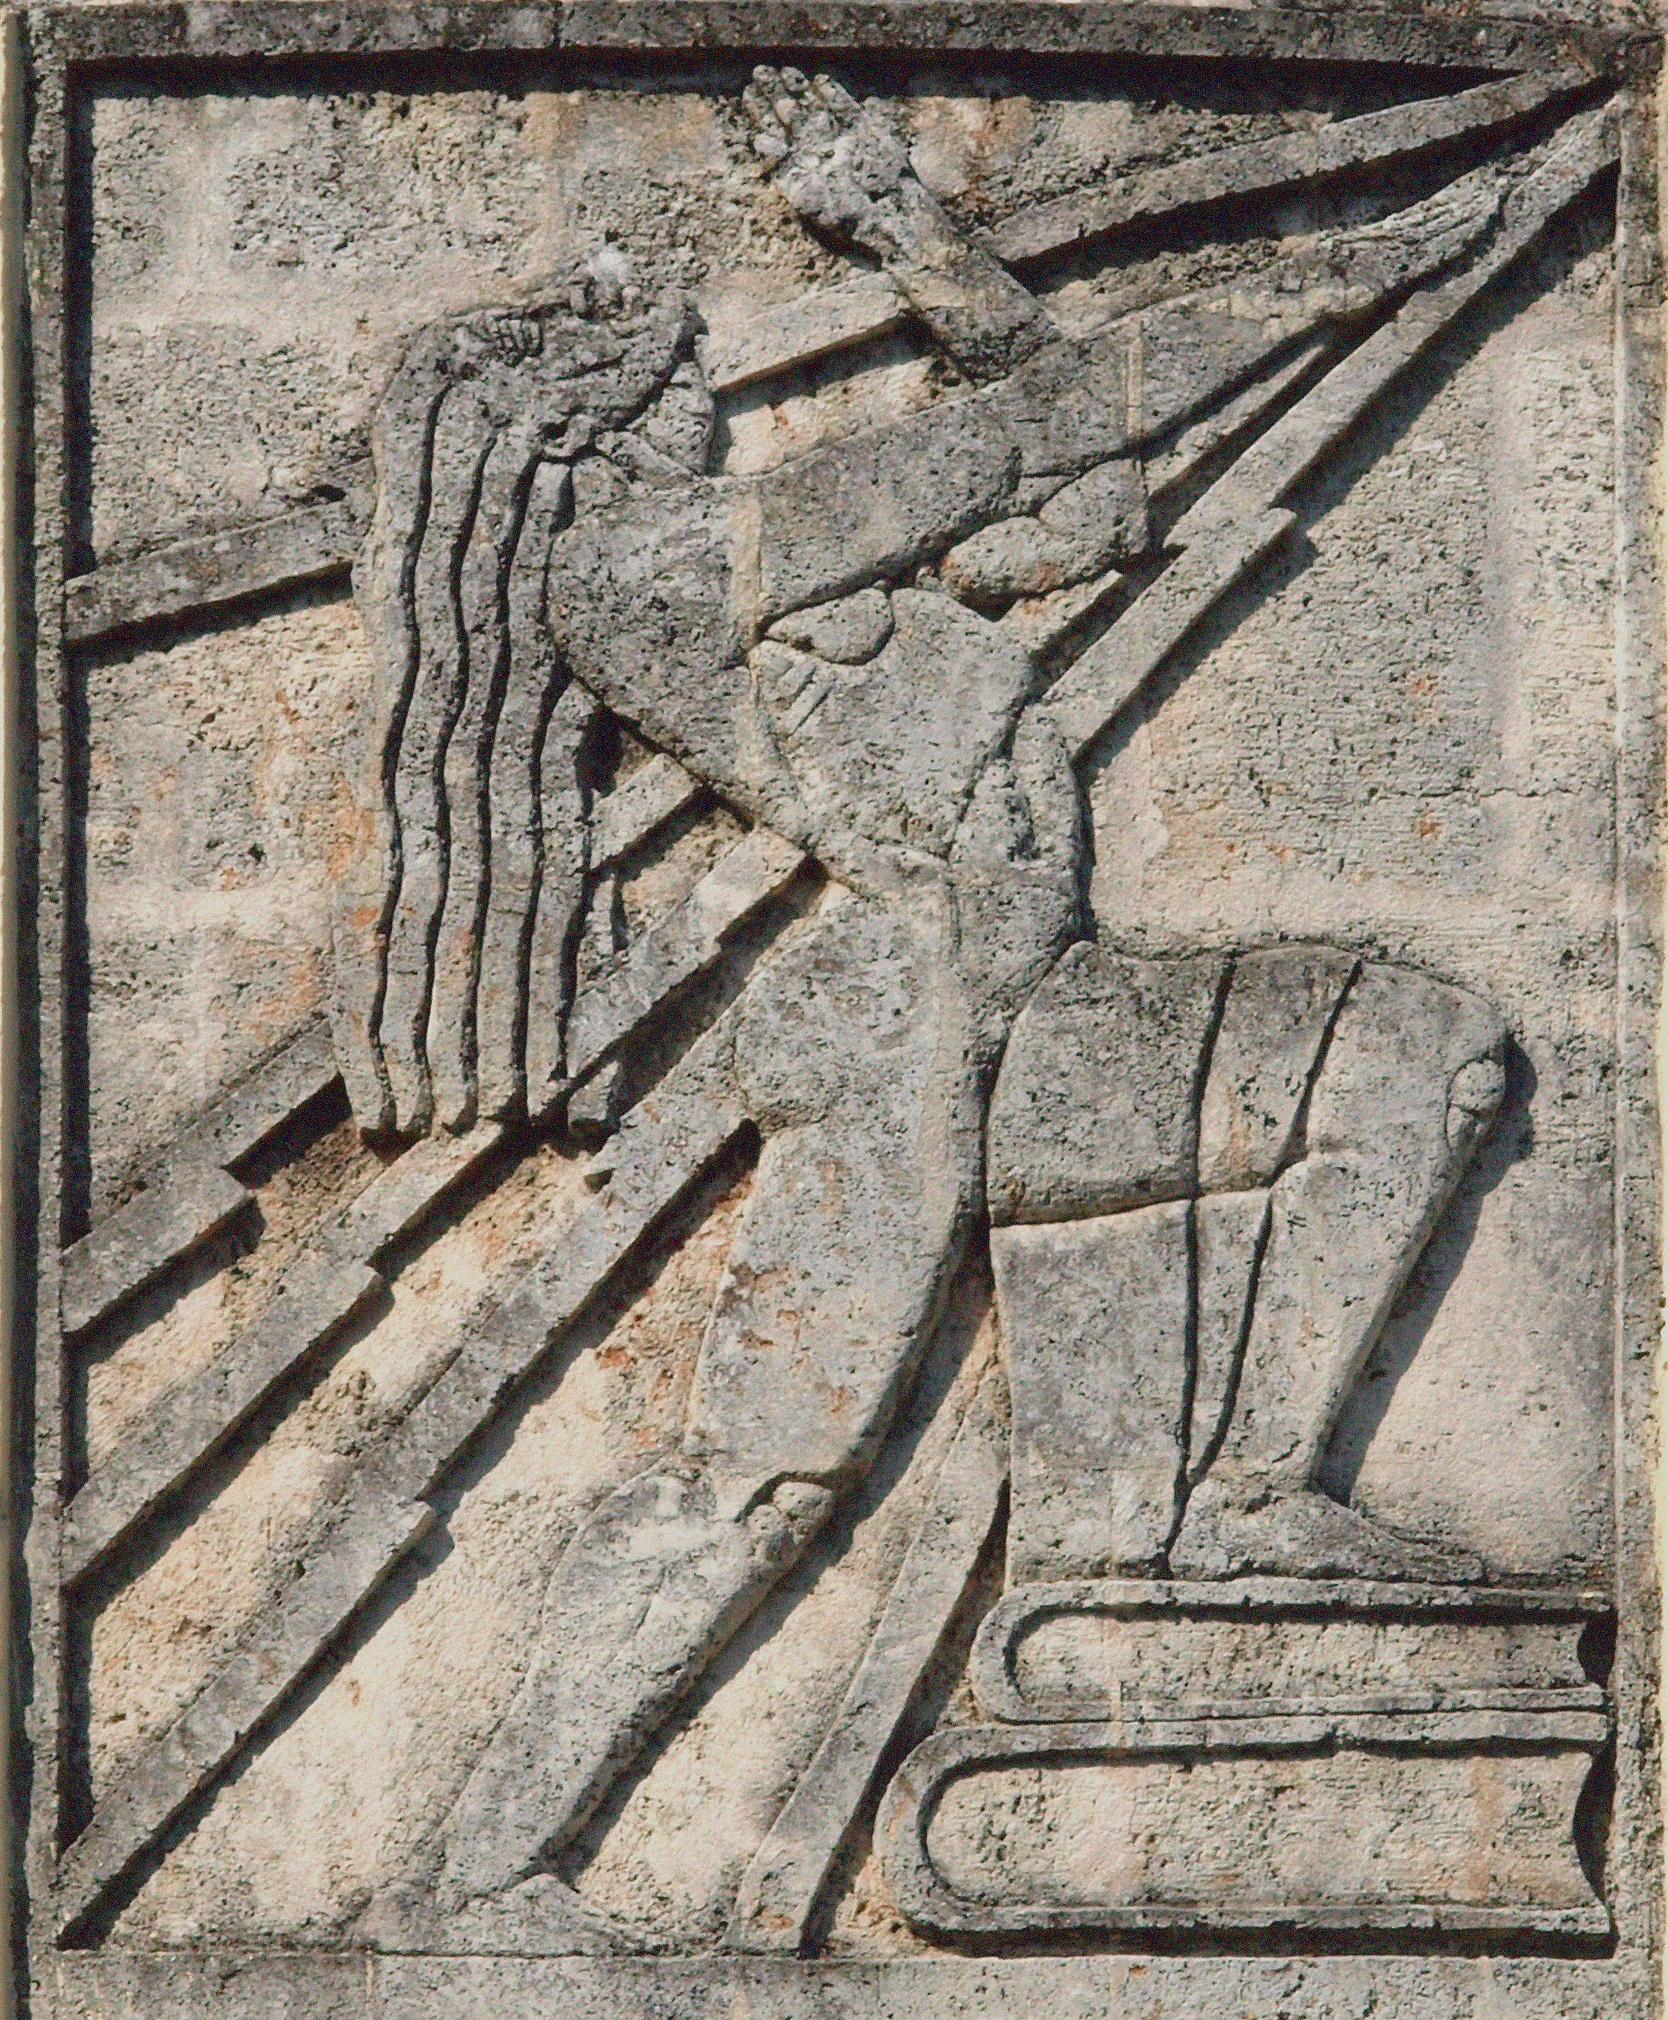 File:Art Deco Bas-relief, Havana (8626624602).jpg - Wikimedia Commons